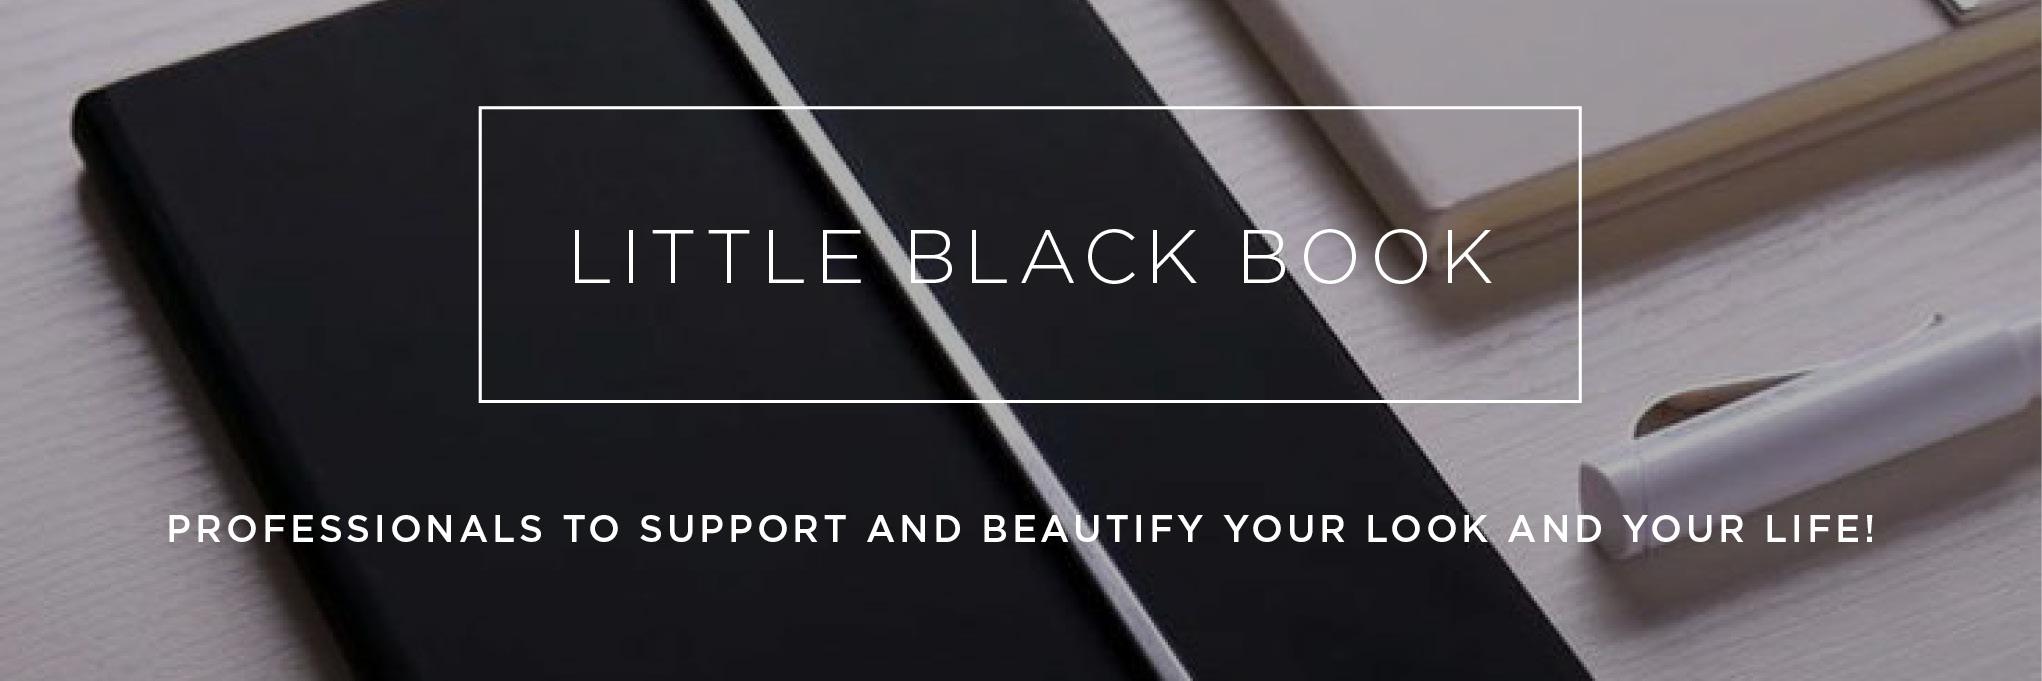 LITTLE BLACK BOOK_PAGE HEADER